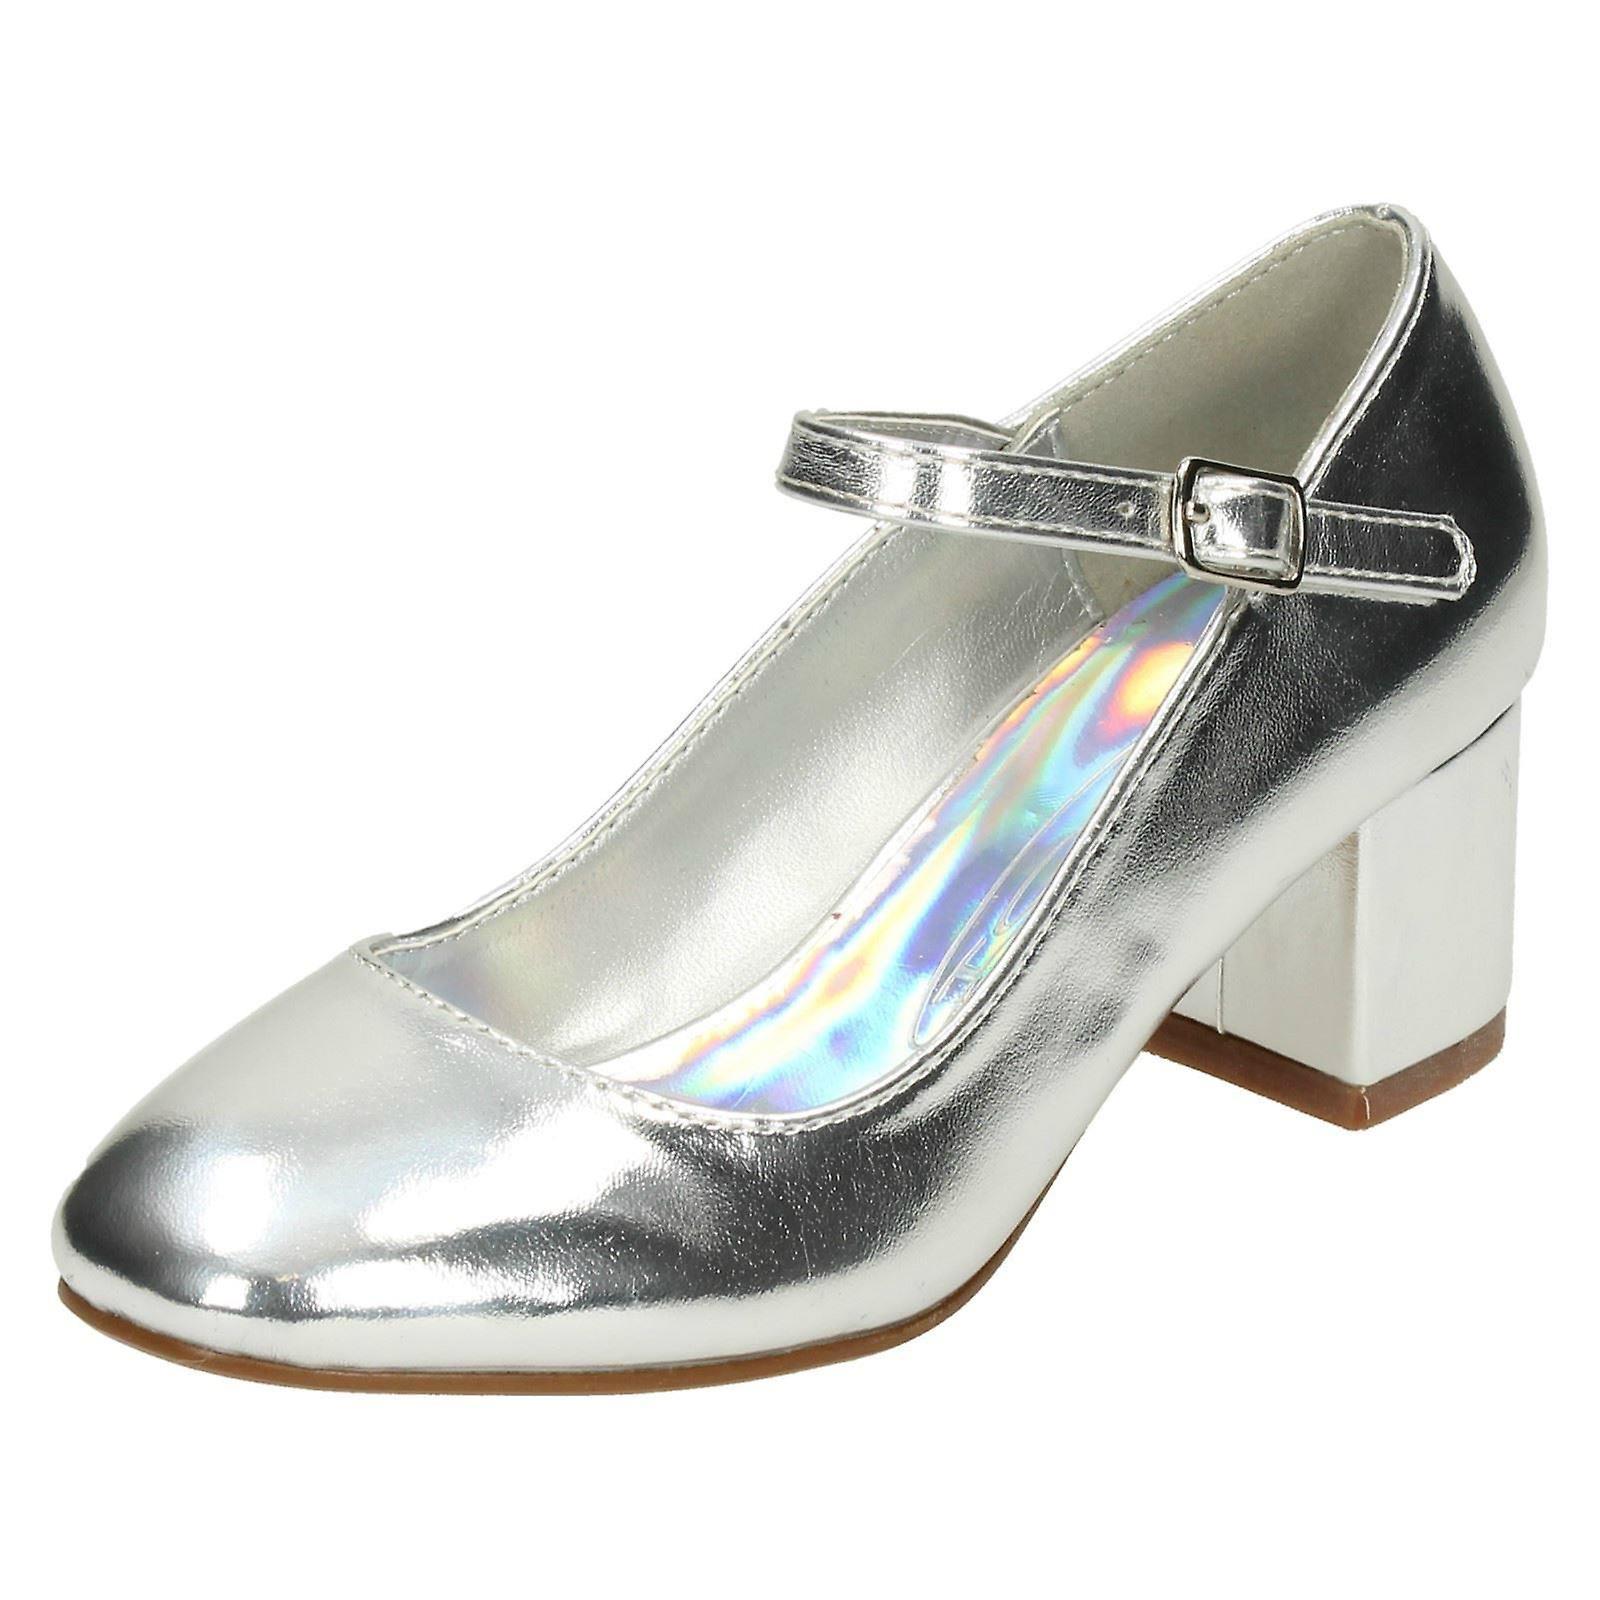 Girls Spot On Blocked Heel Dolly scarpe H3056 | Di Modo Attraente  | Uomo/Donna Scarpa